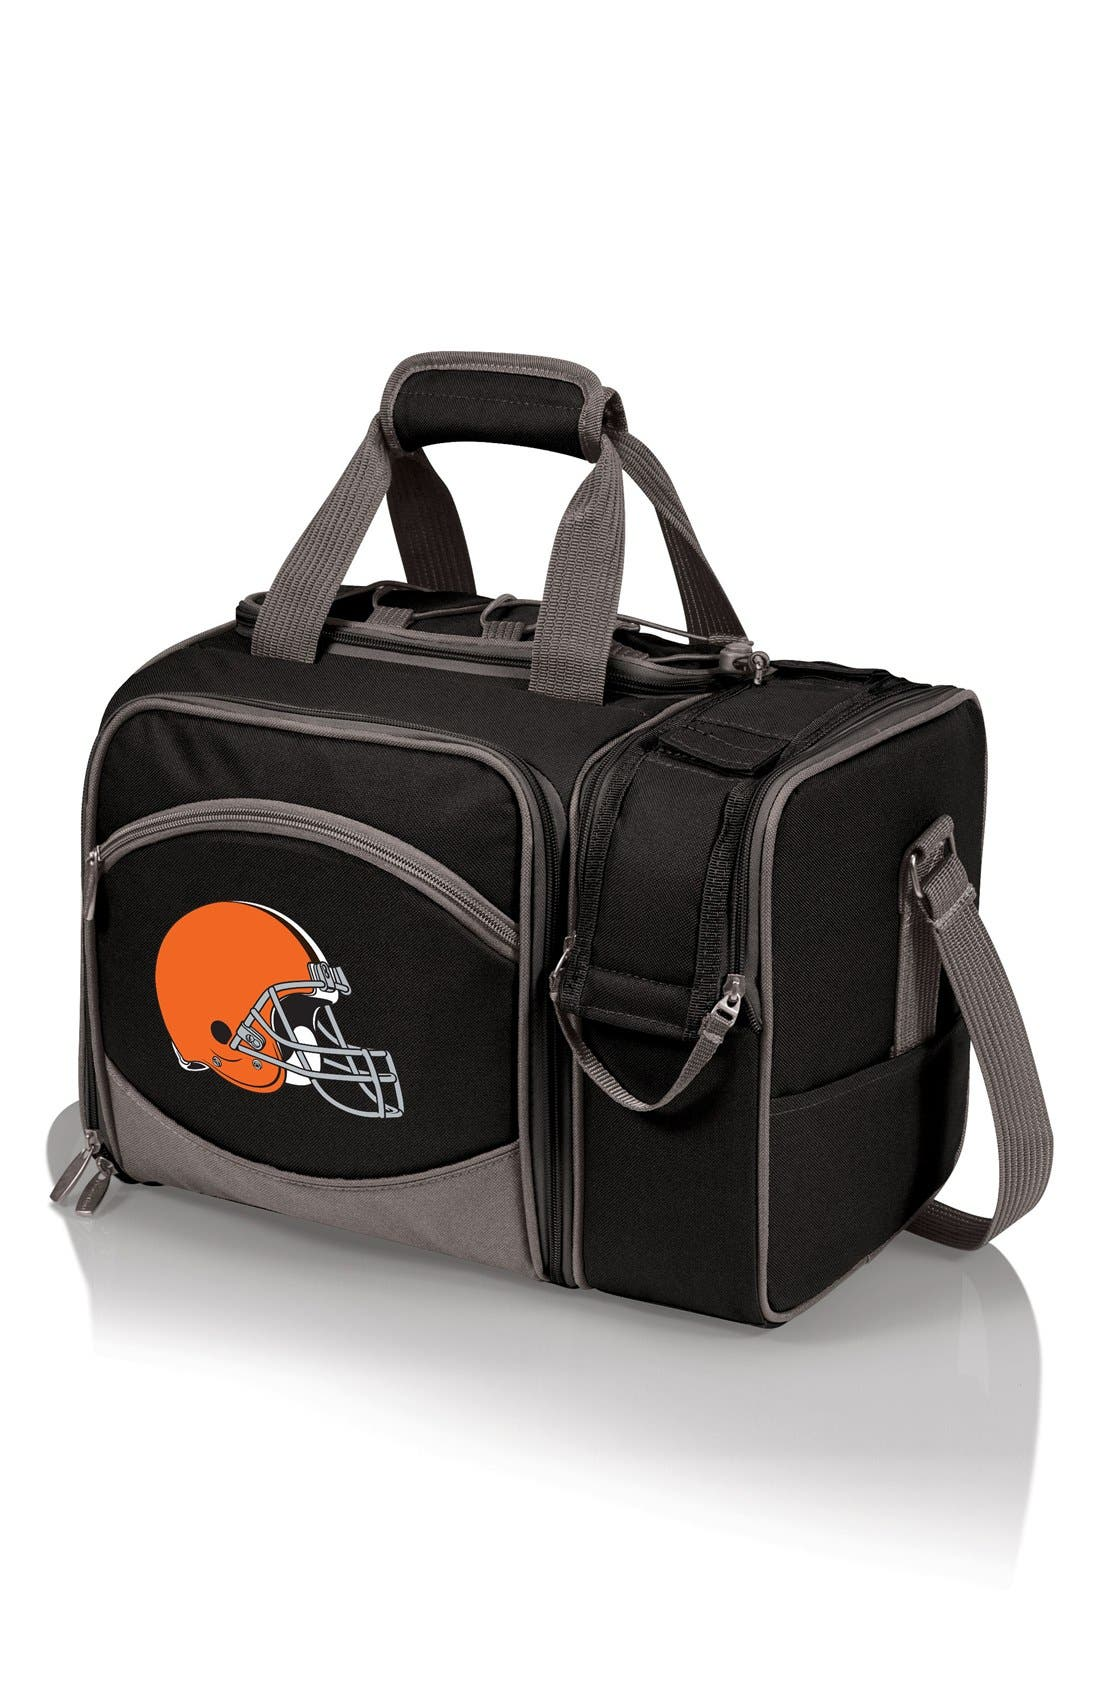 Picnic Time 'Malibu' NFL Insulated Picnic Pack